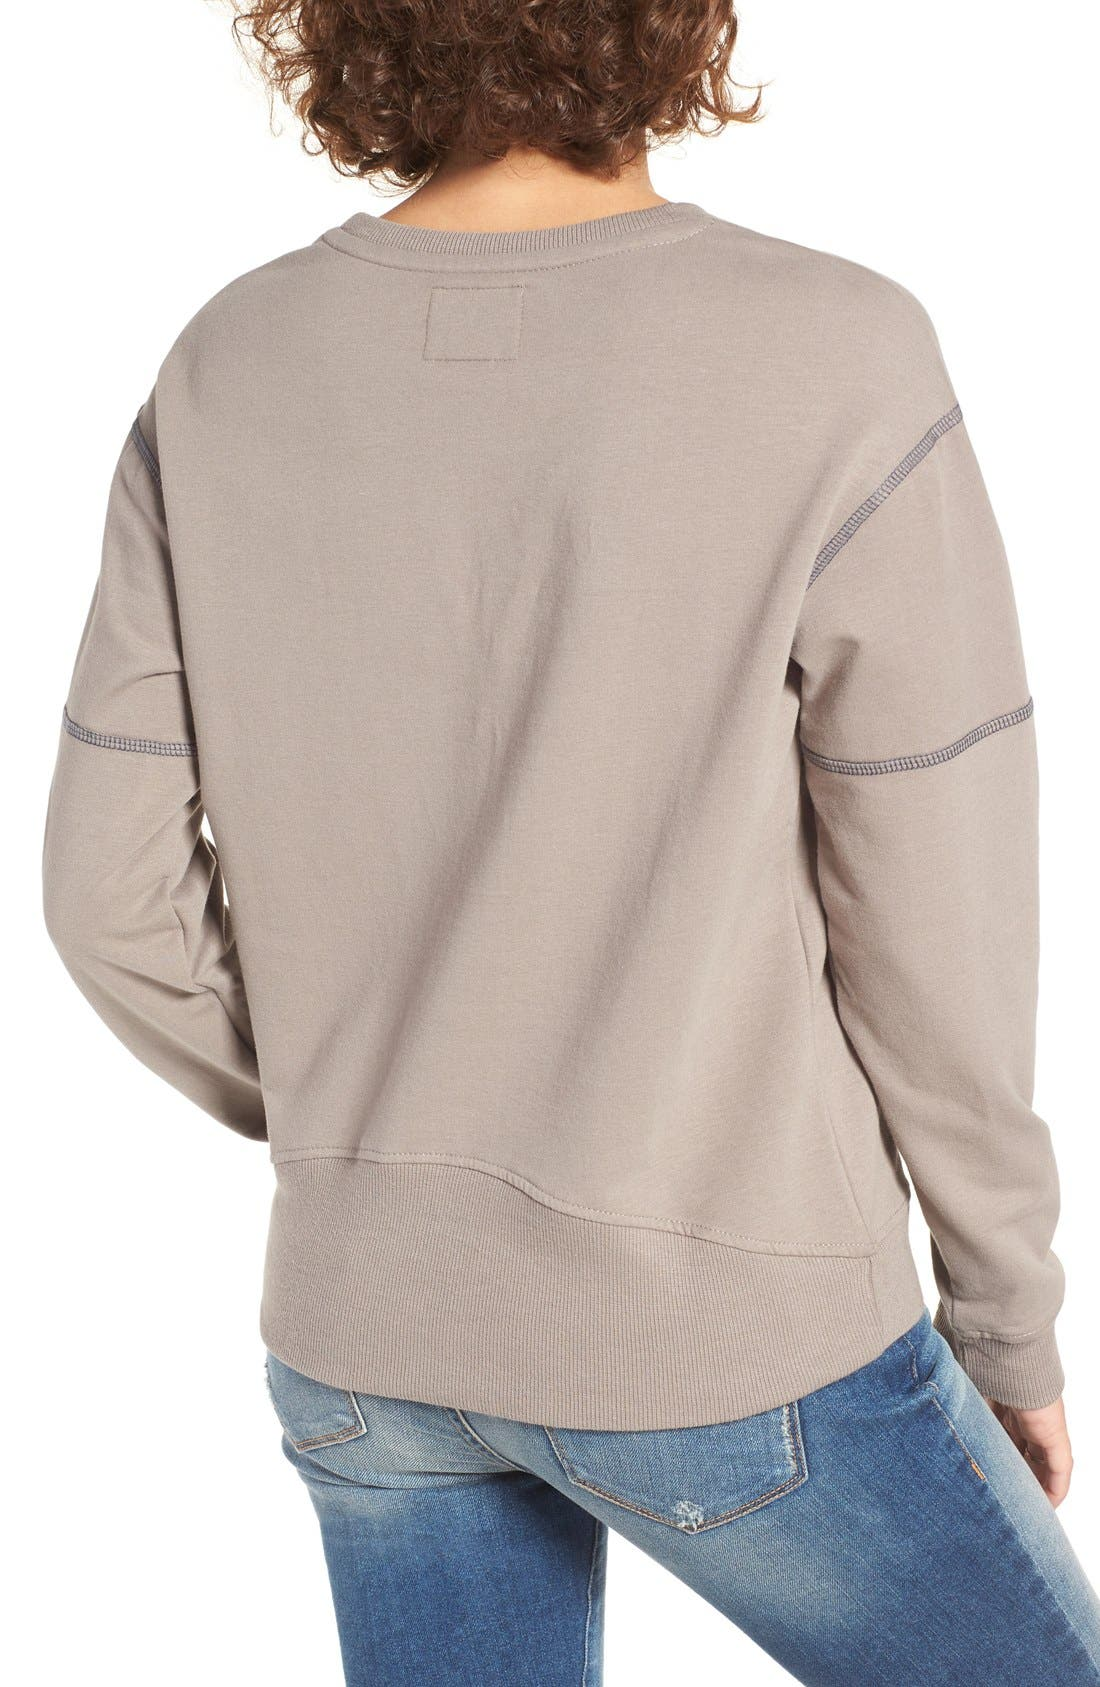 Alternate Image 2  - 47 Brand 'Seattle Seahawks' Graphic Sweatshirt